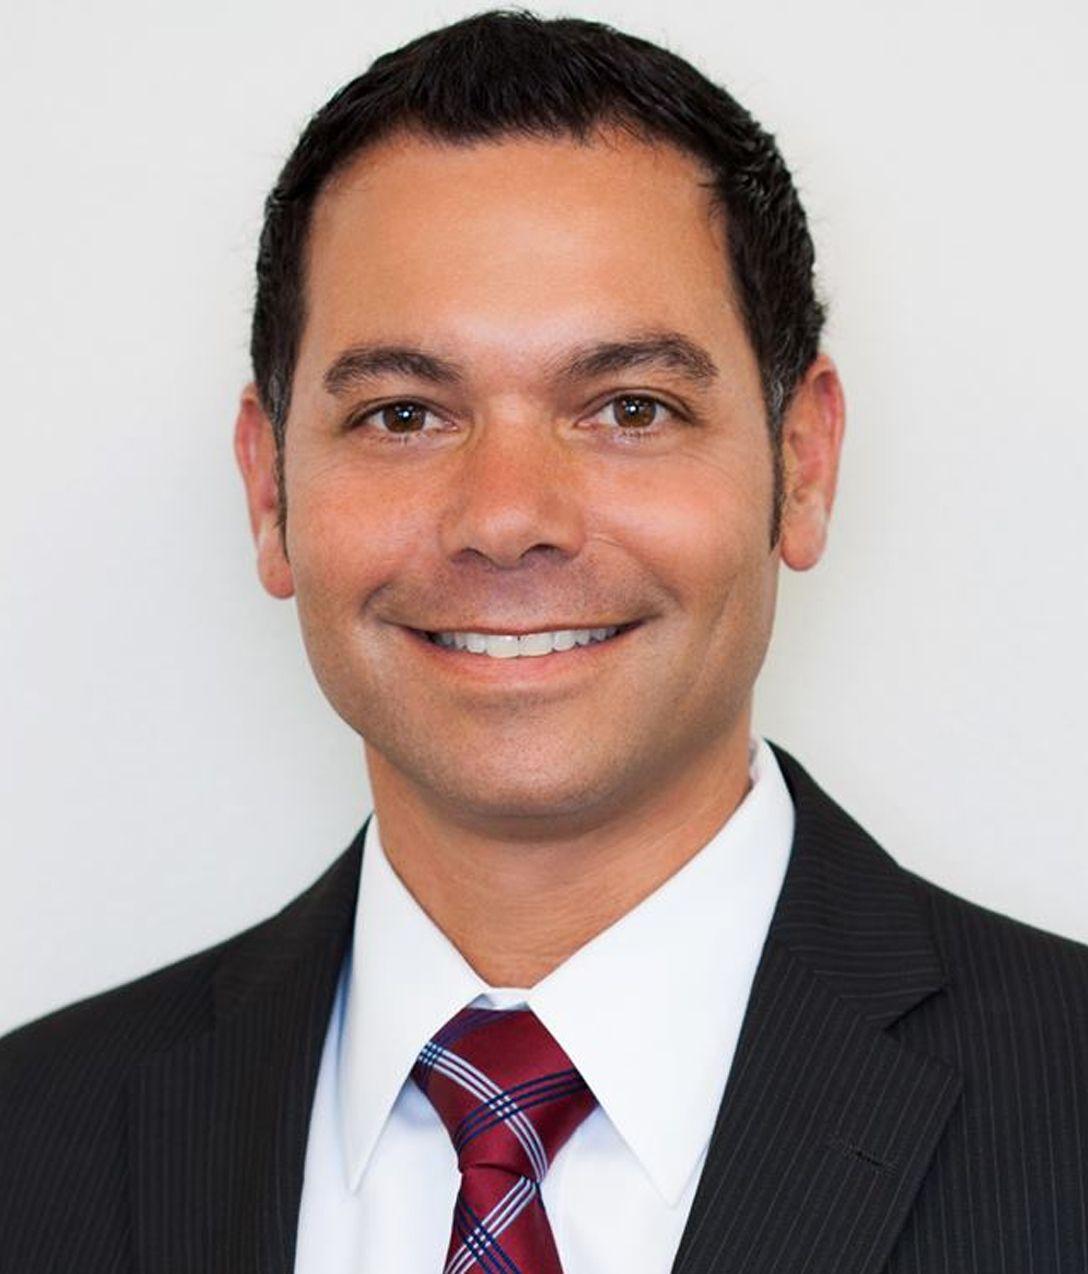 Jonathan Jerotz, Synergy 1 Lending